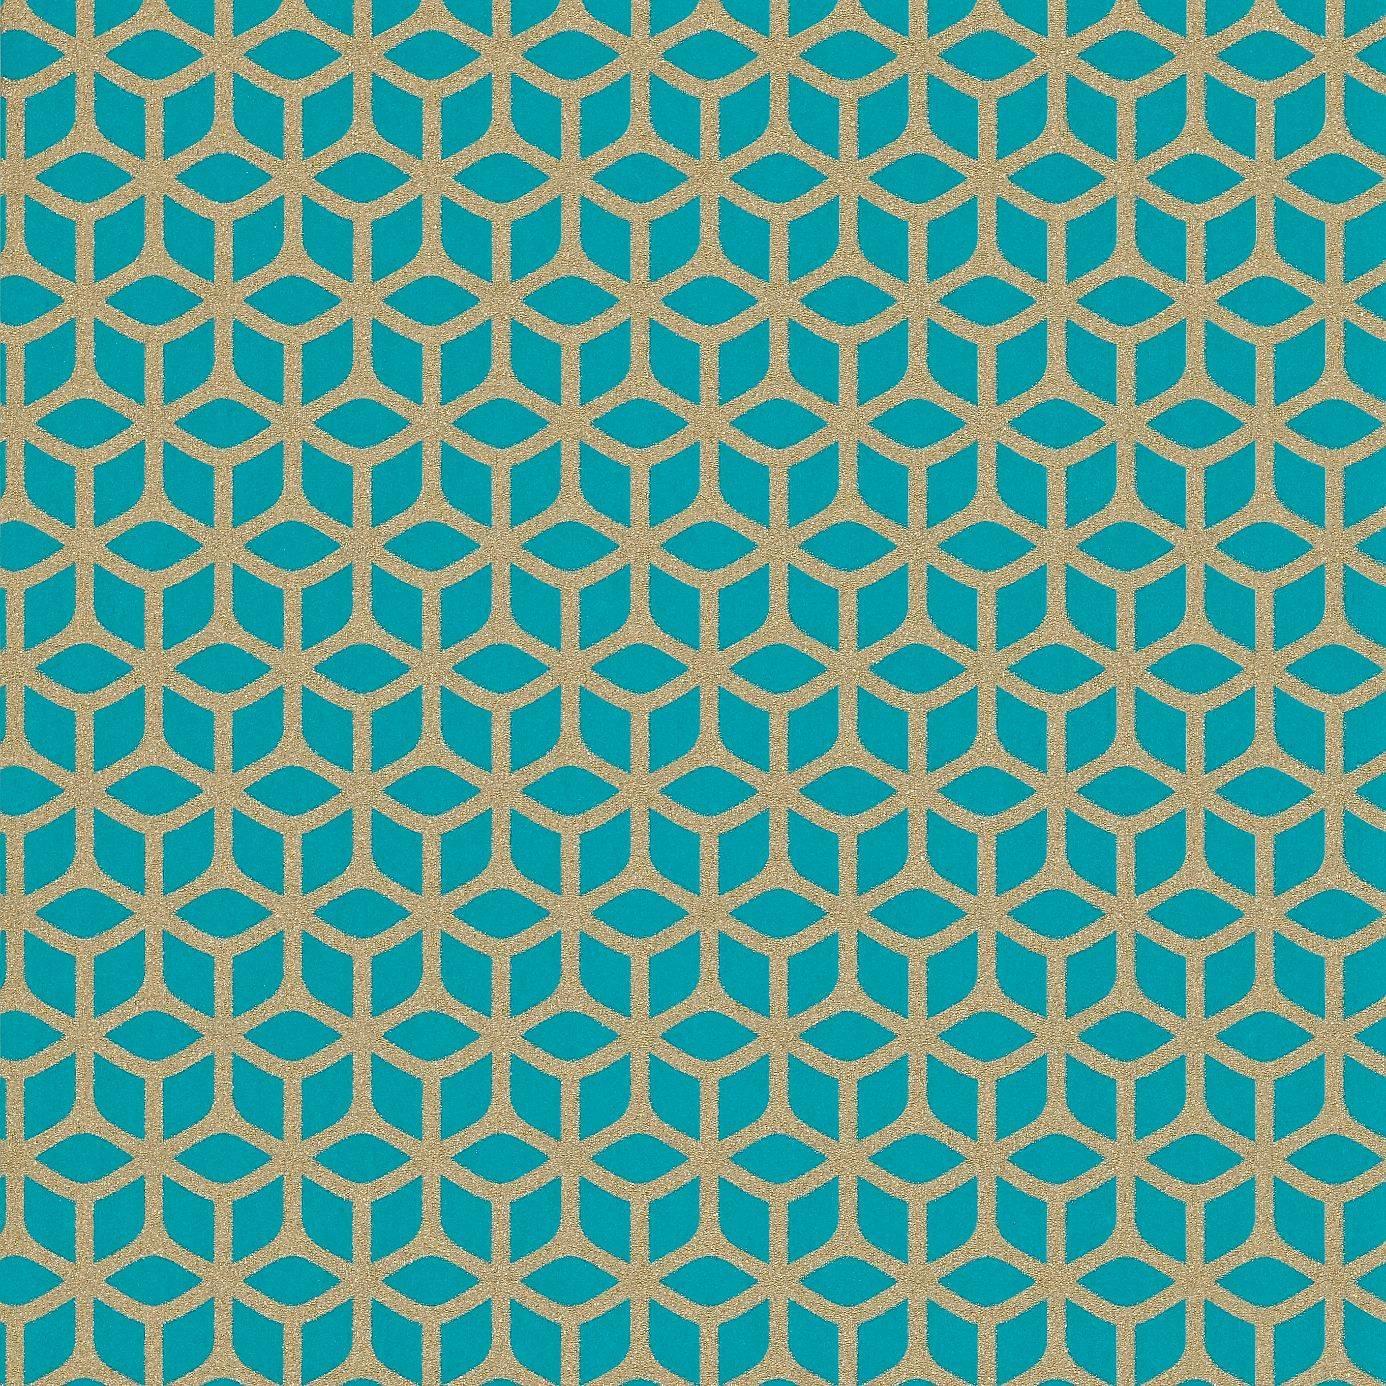 harlequin momentum wallpapers vol 2 trellis wallpaper teal 110381 loading zoom - Trellis Wall Paper